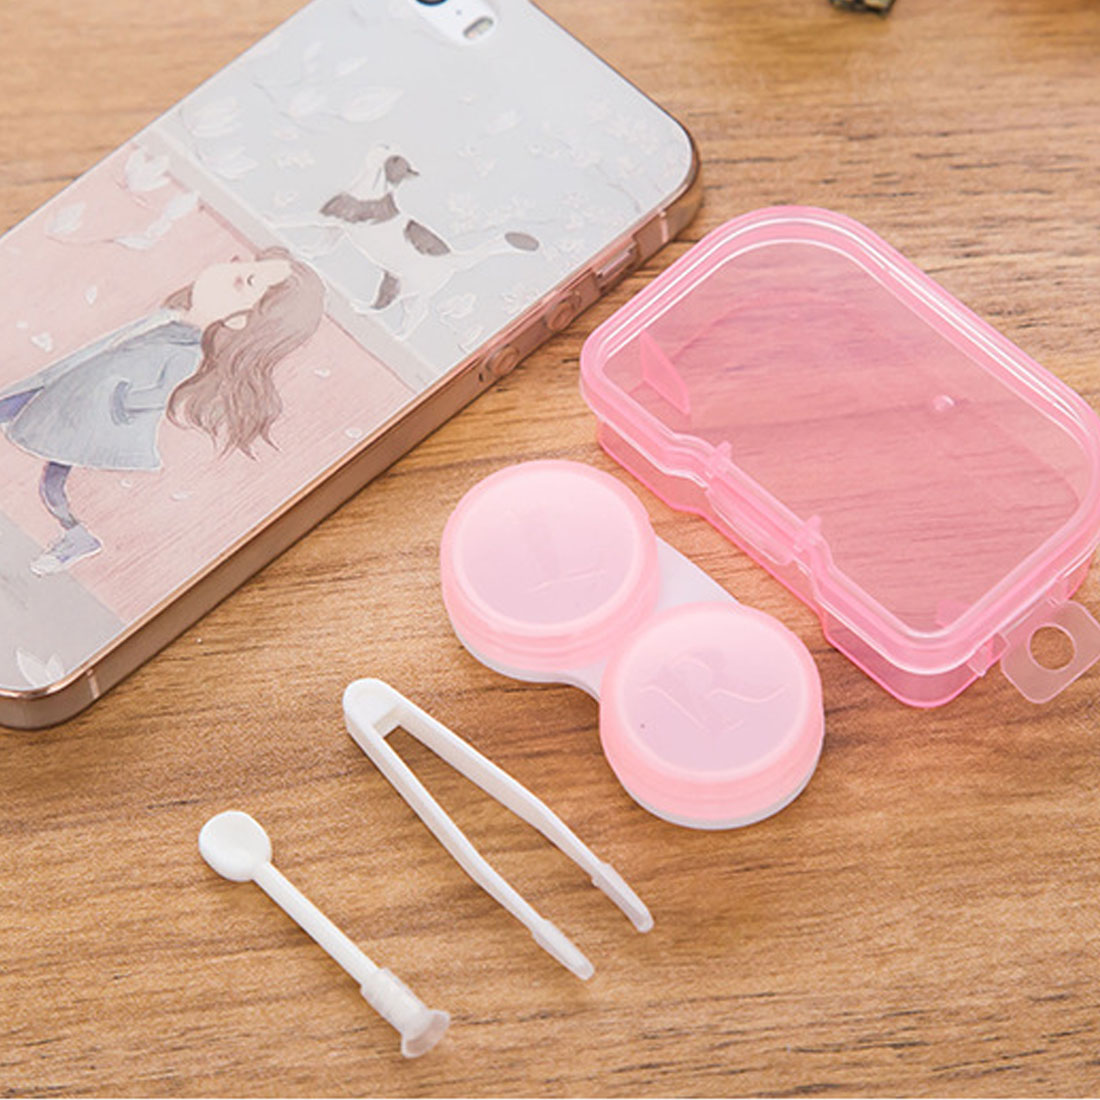 HOT Random Color 1 Piece Best Transparent Pocket Plastic Contact Lens Case Travel Kit Easy Take Container Holder